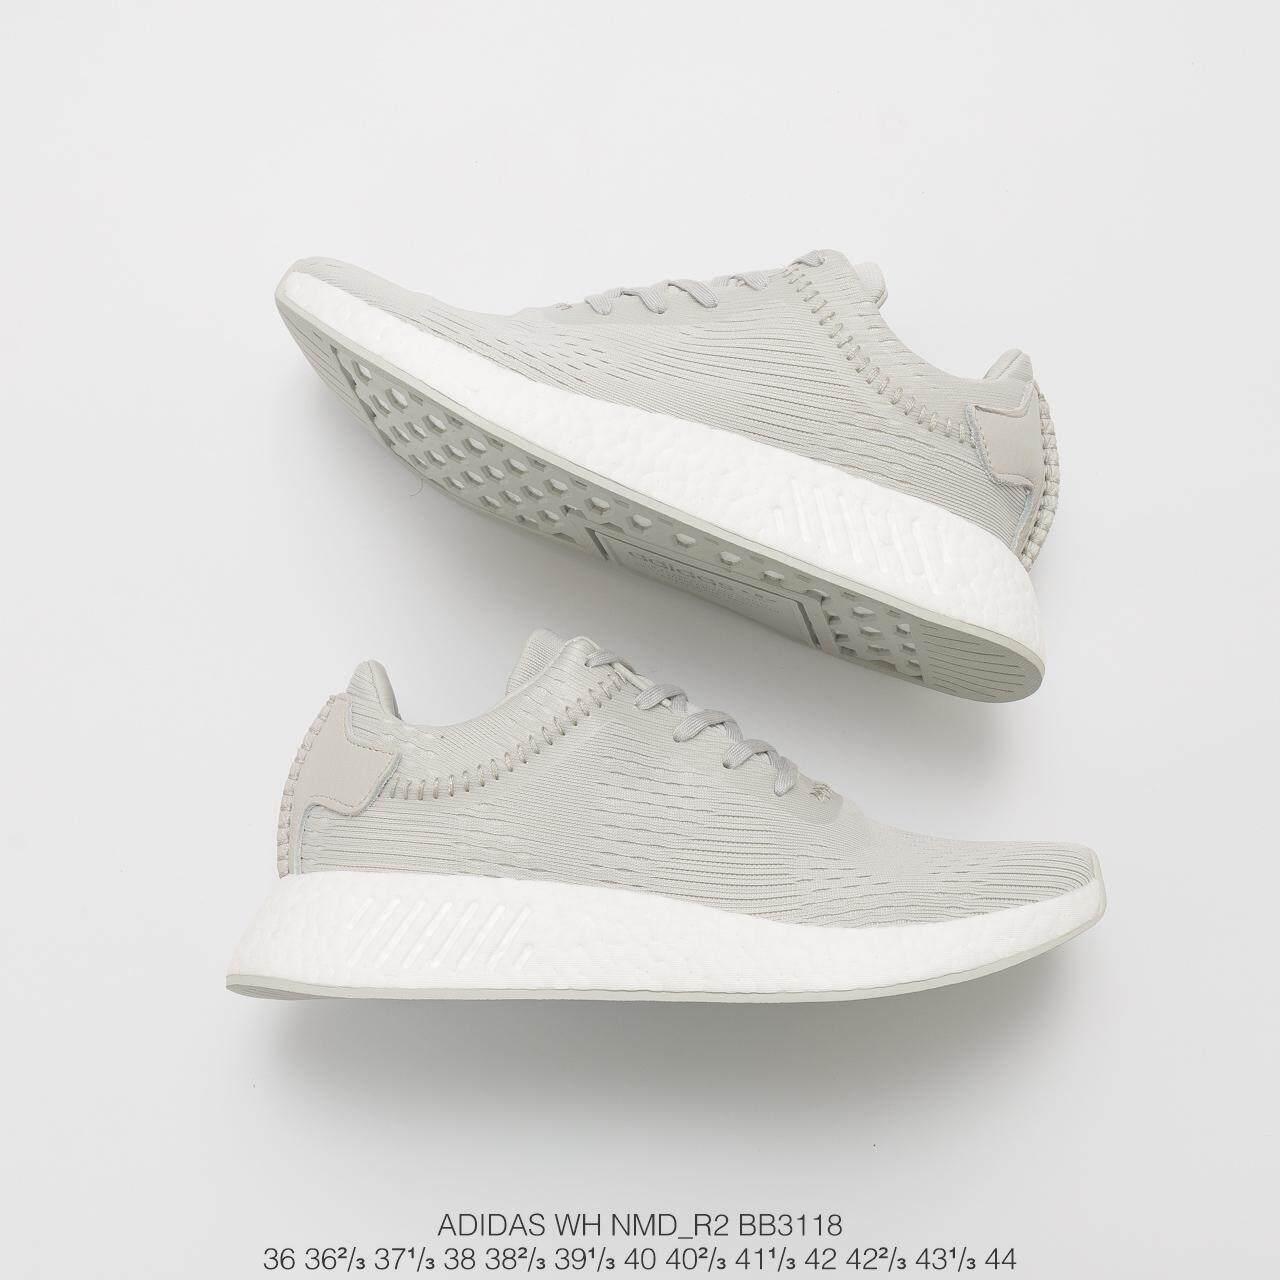 huge discount 75258 cccb7 Sale ADIDA NMD  R2 Wings + Horns BB3118 Primeknit PK Women and Mens Sneaker  Light Grey